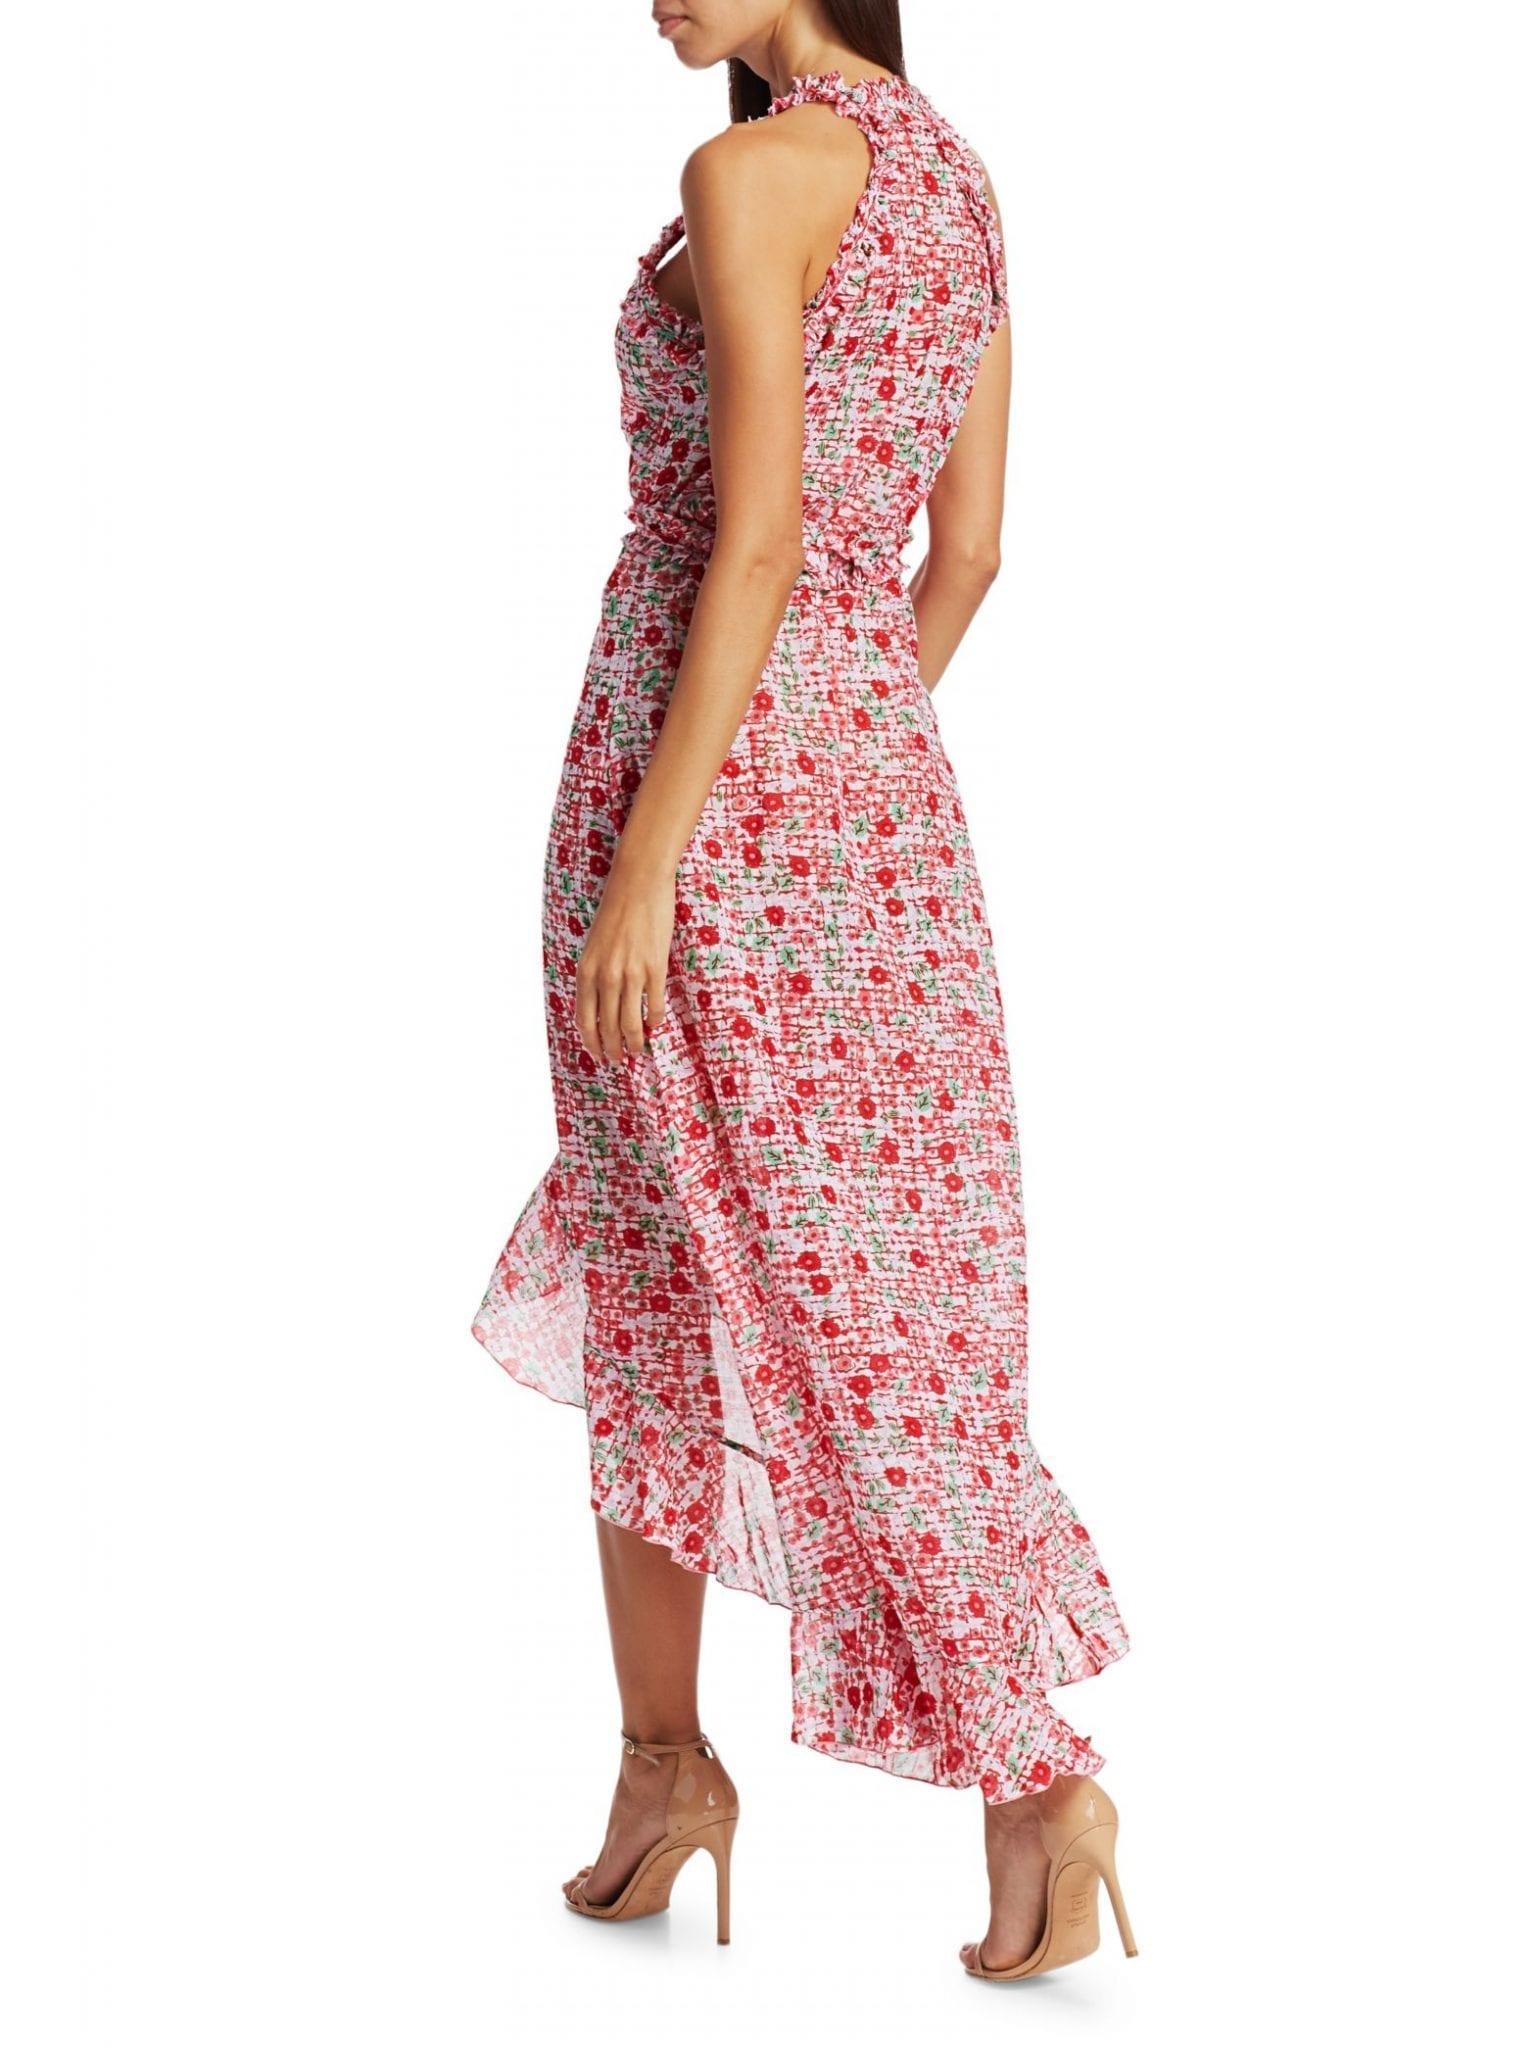 POUPETTE ST BARTH Tamara Floral Wrap Dress